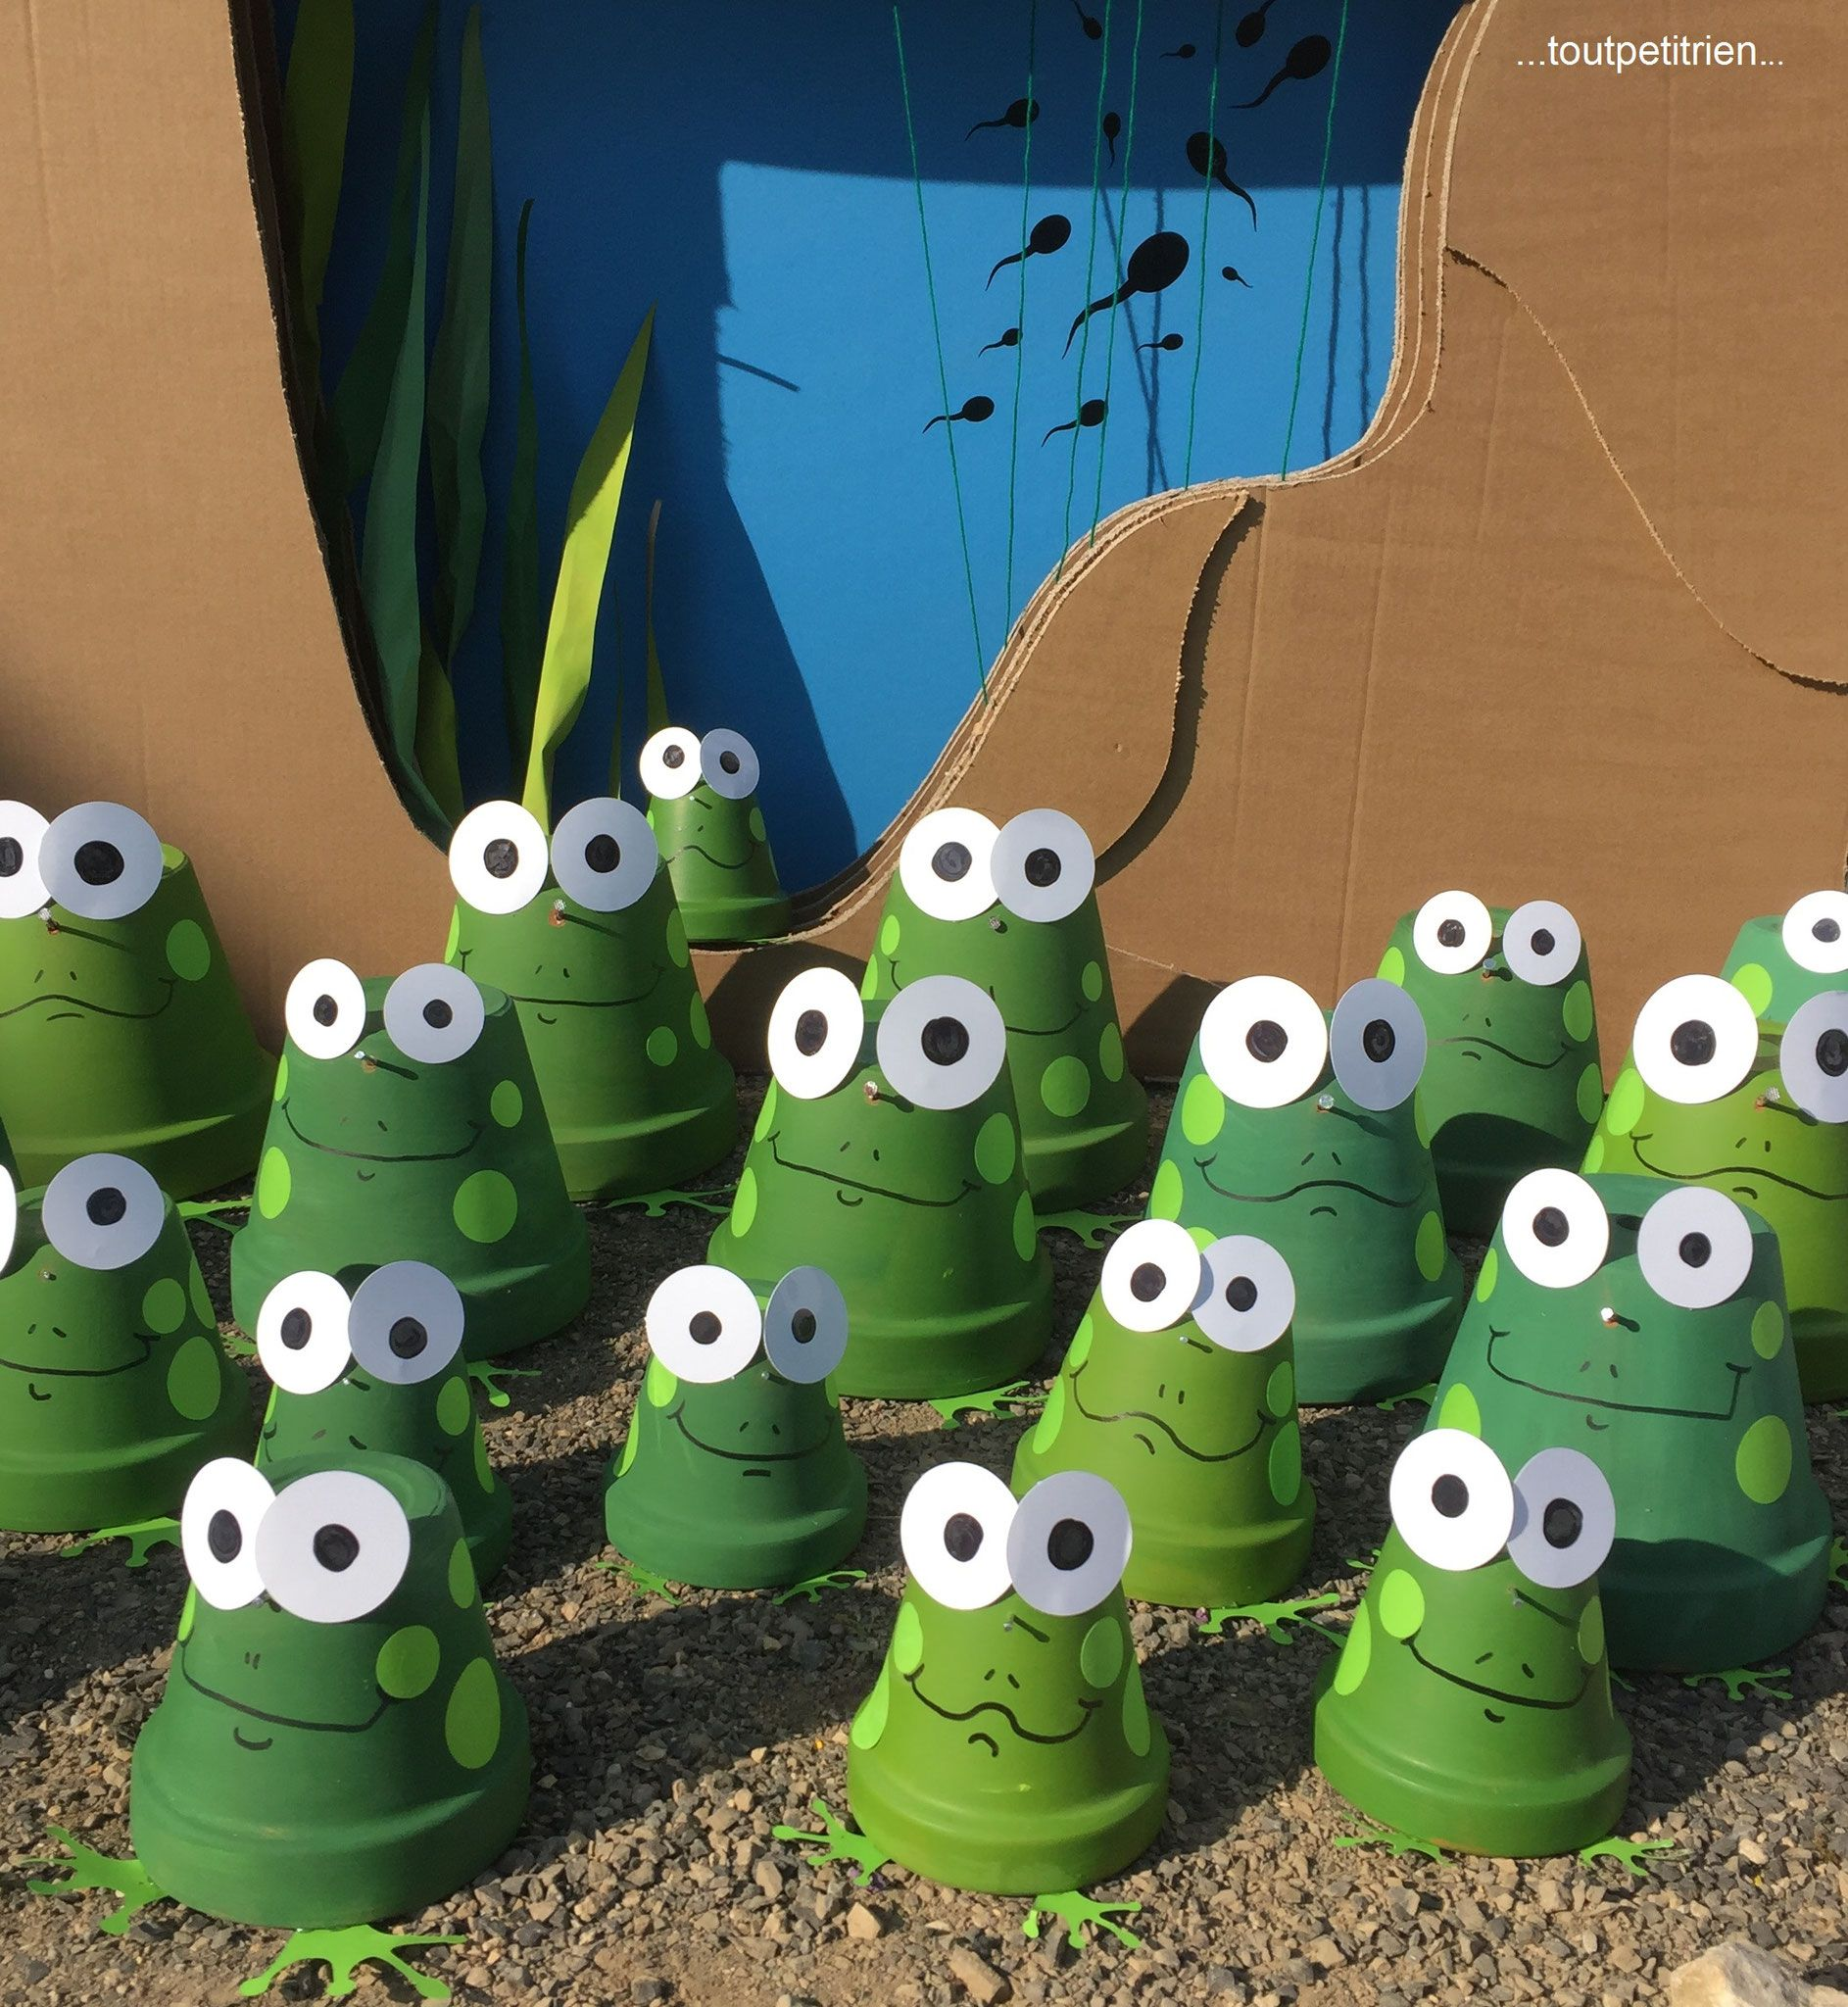 bricolage enfants grenouilles avec des pots en terre cuite. Black Bedroom Furniture Sets. Home Design Ideas